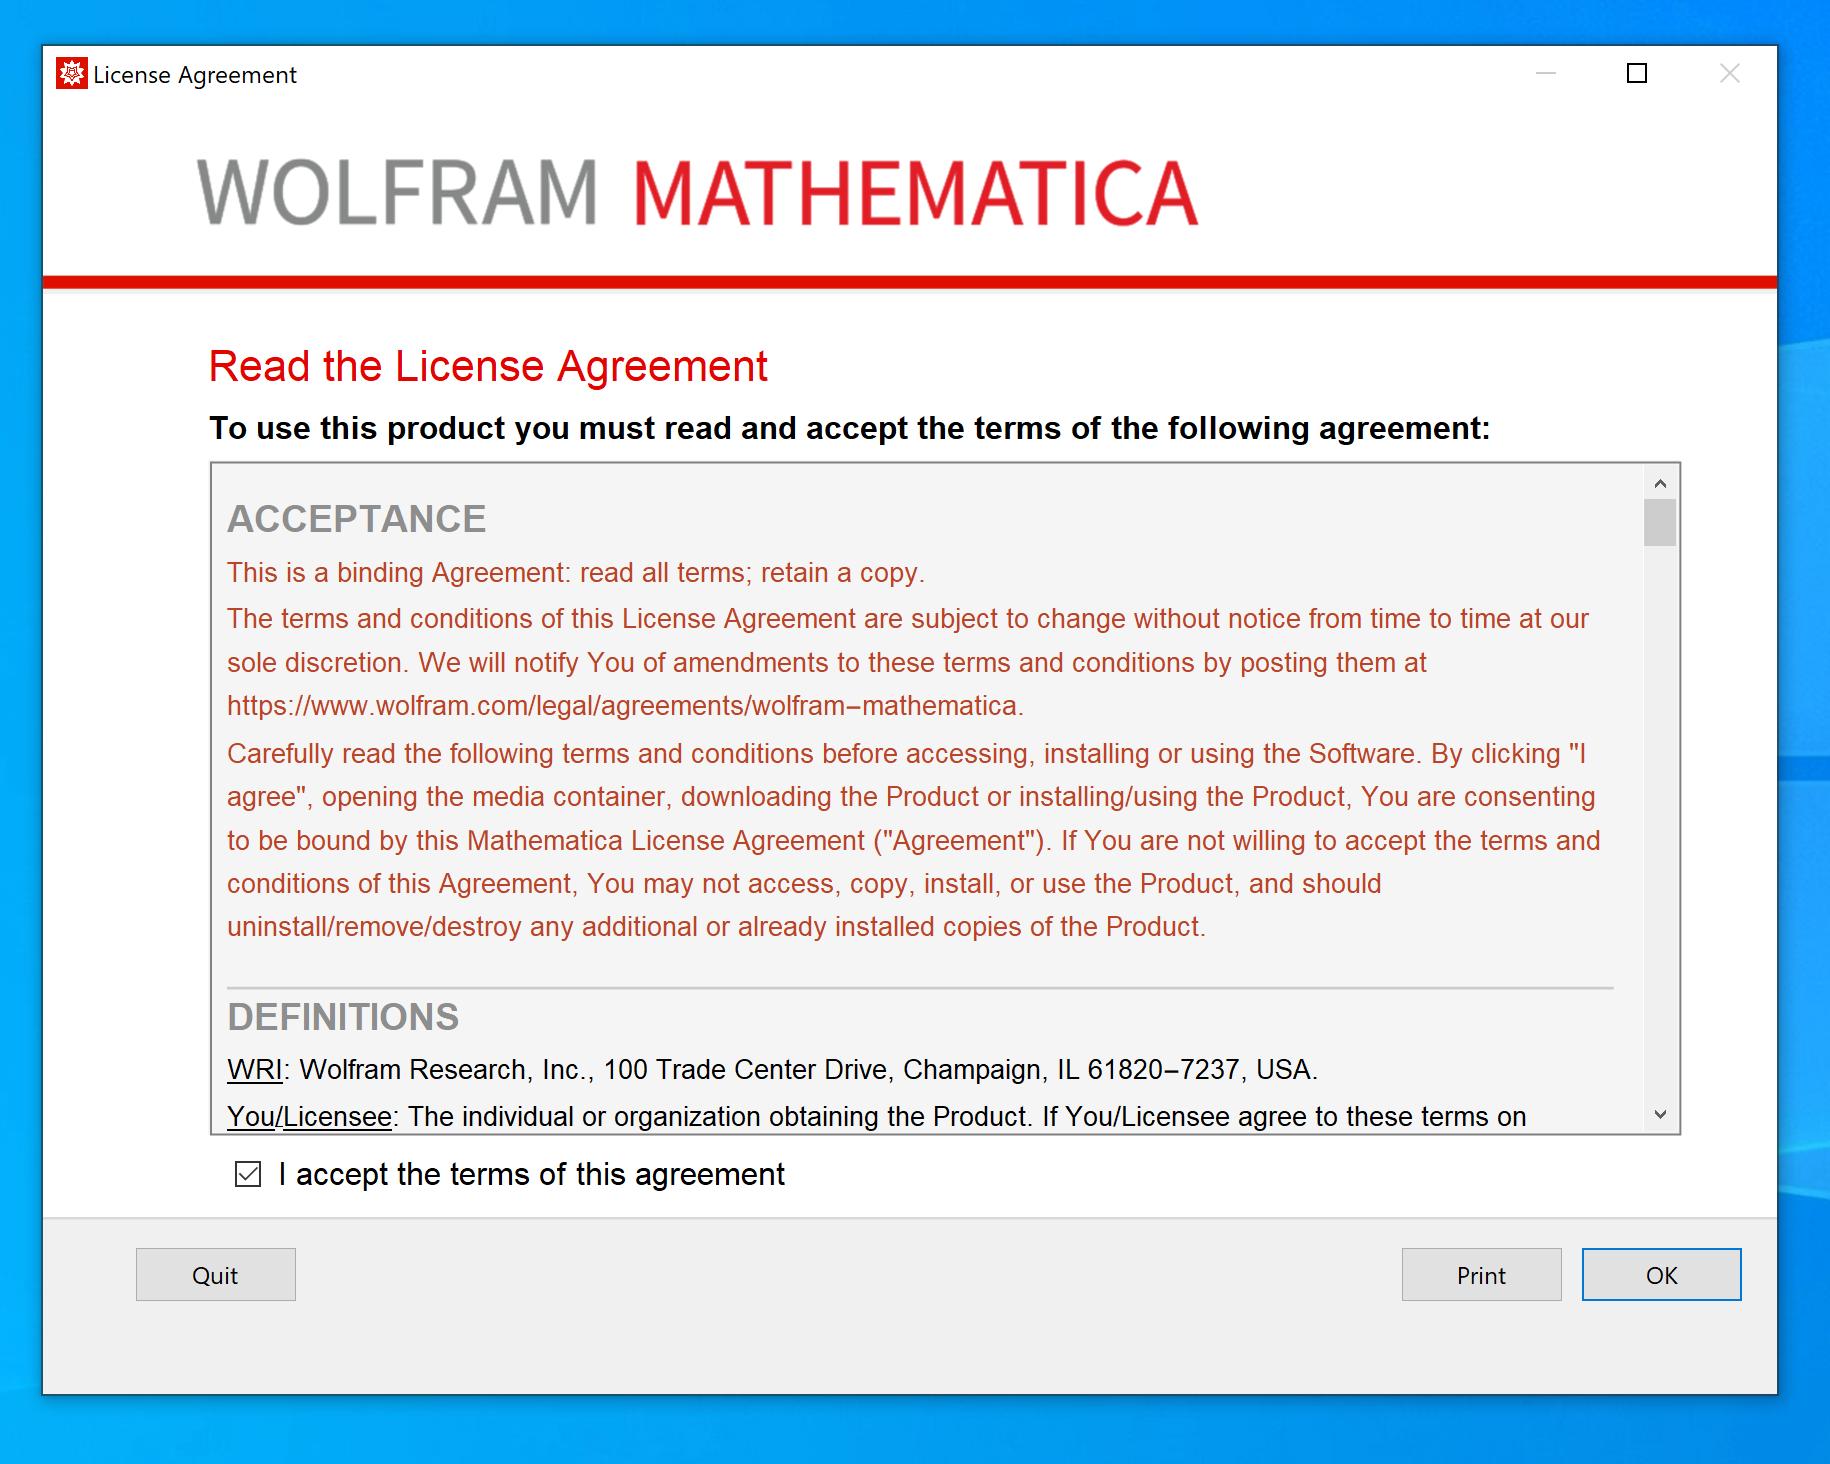 mathematica_lic00004.png